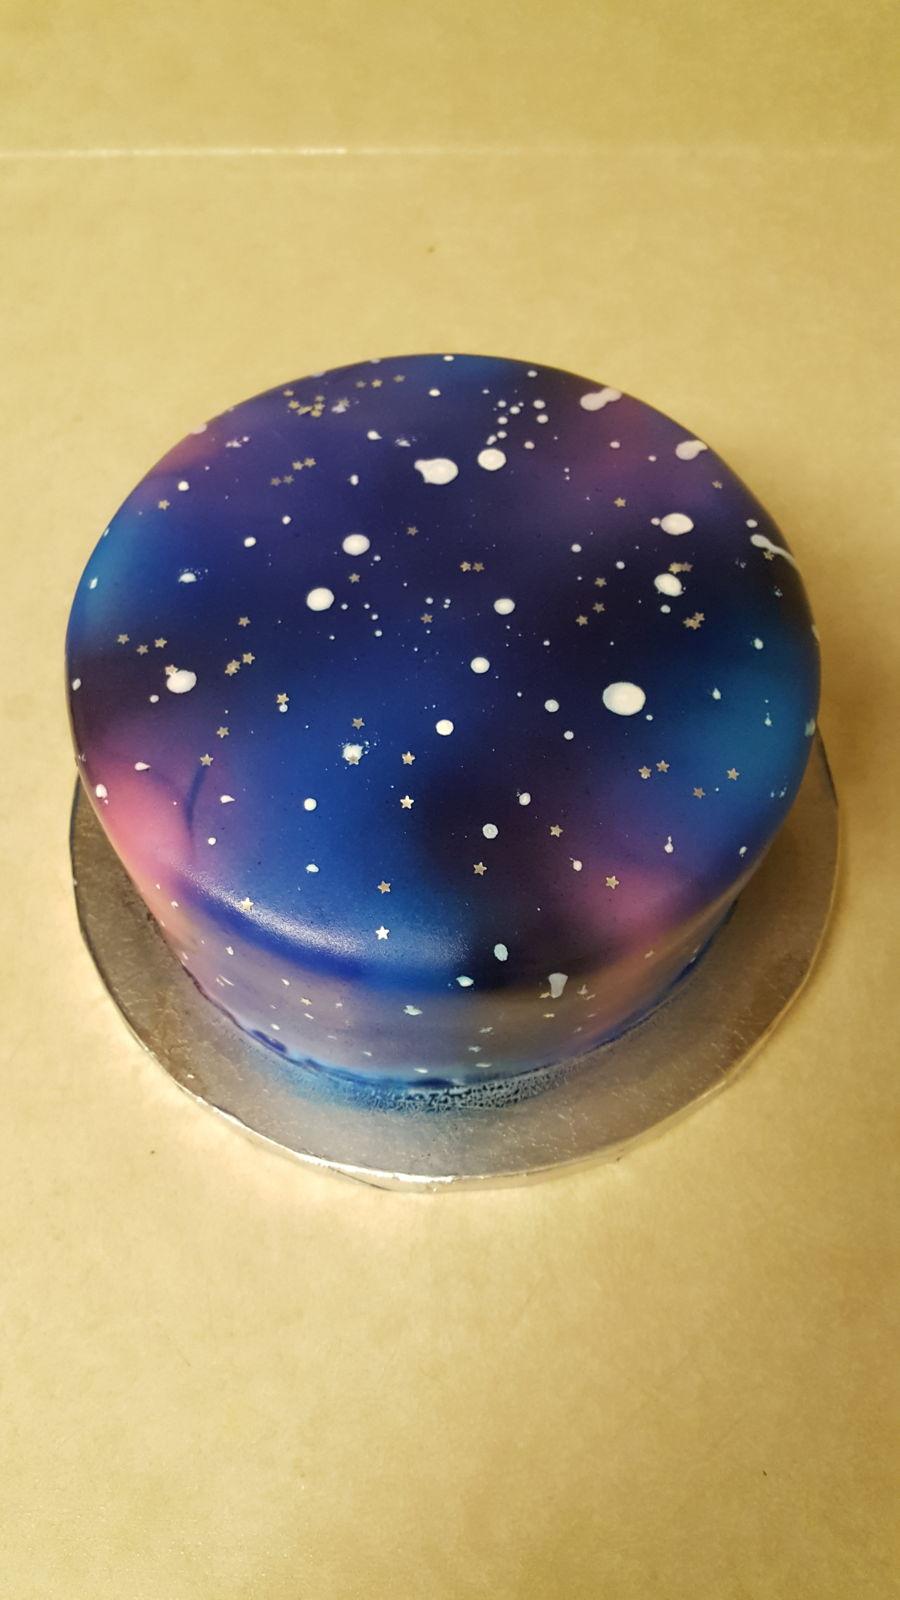 Chocolate Pound Cake Wilton